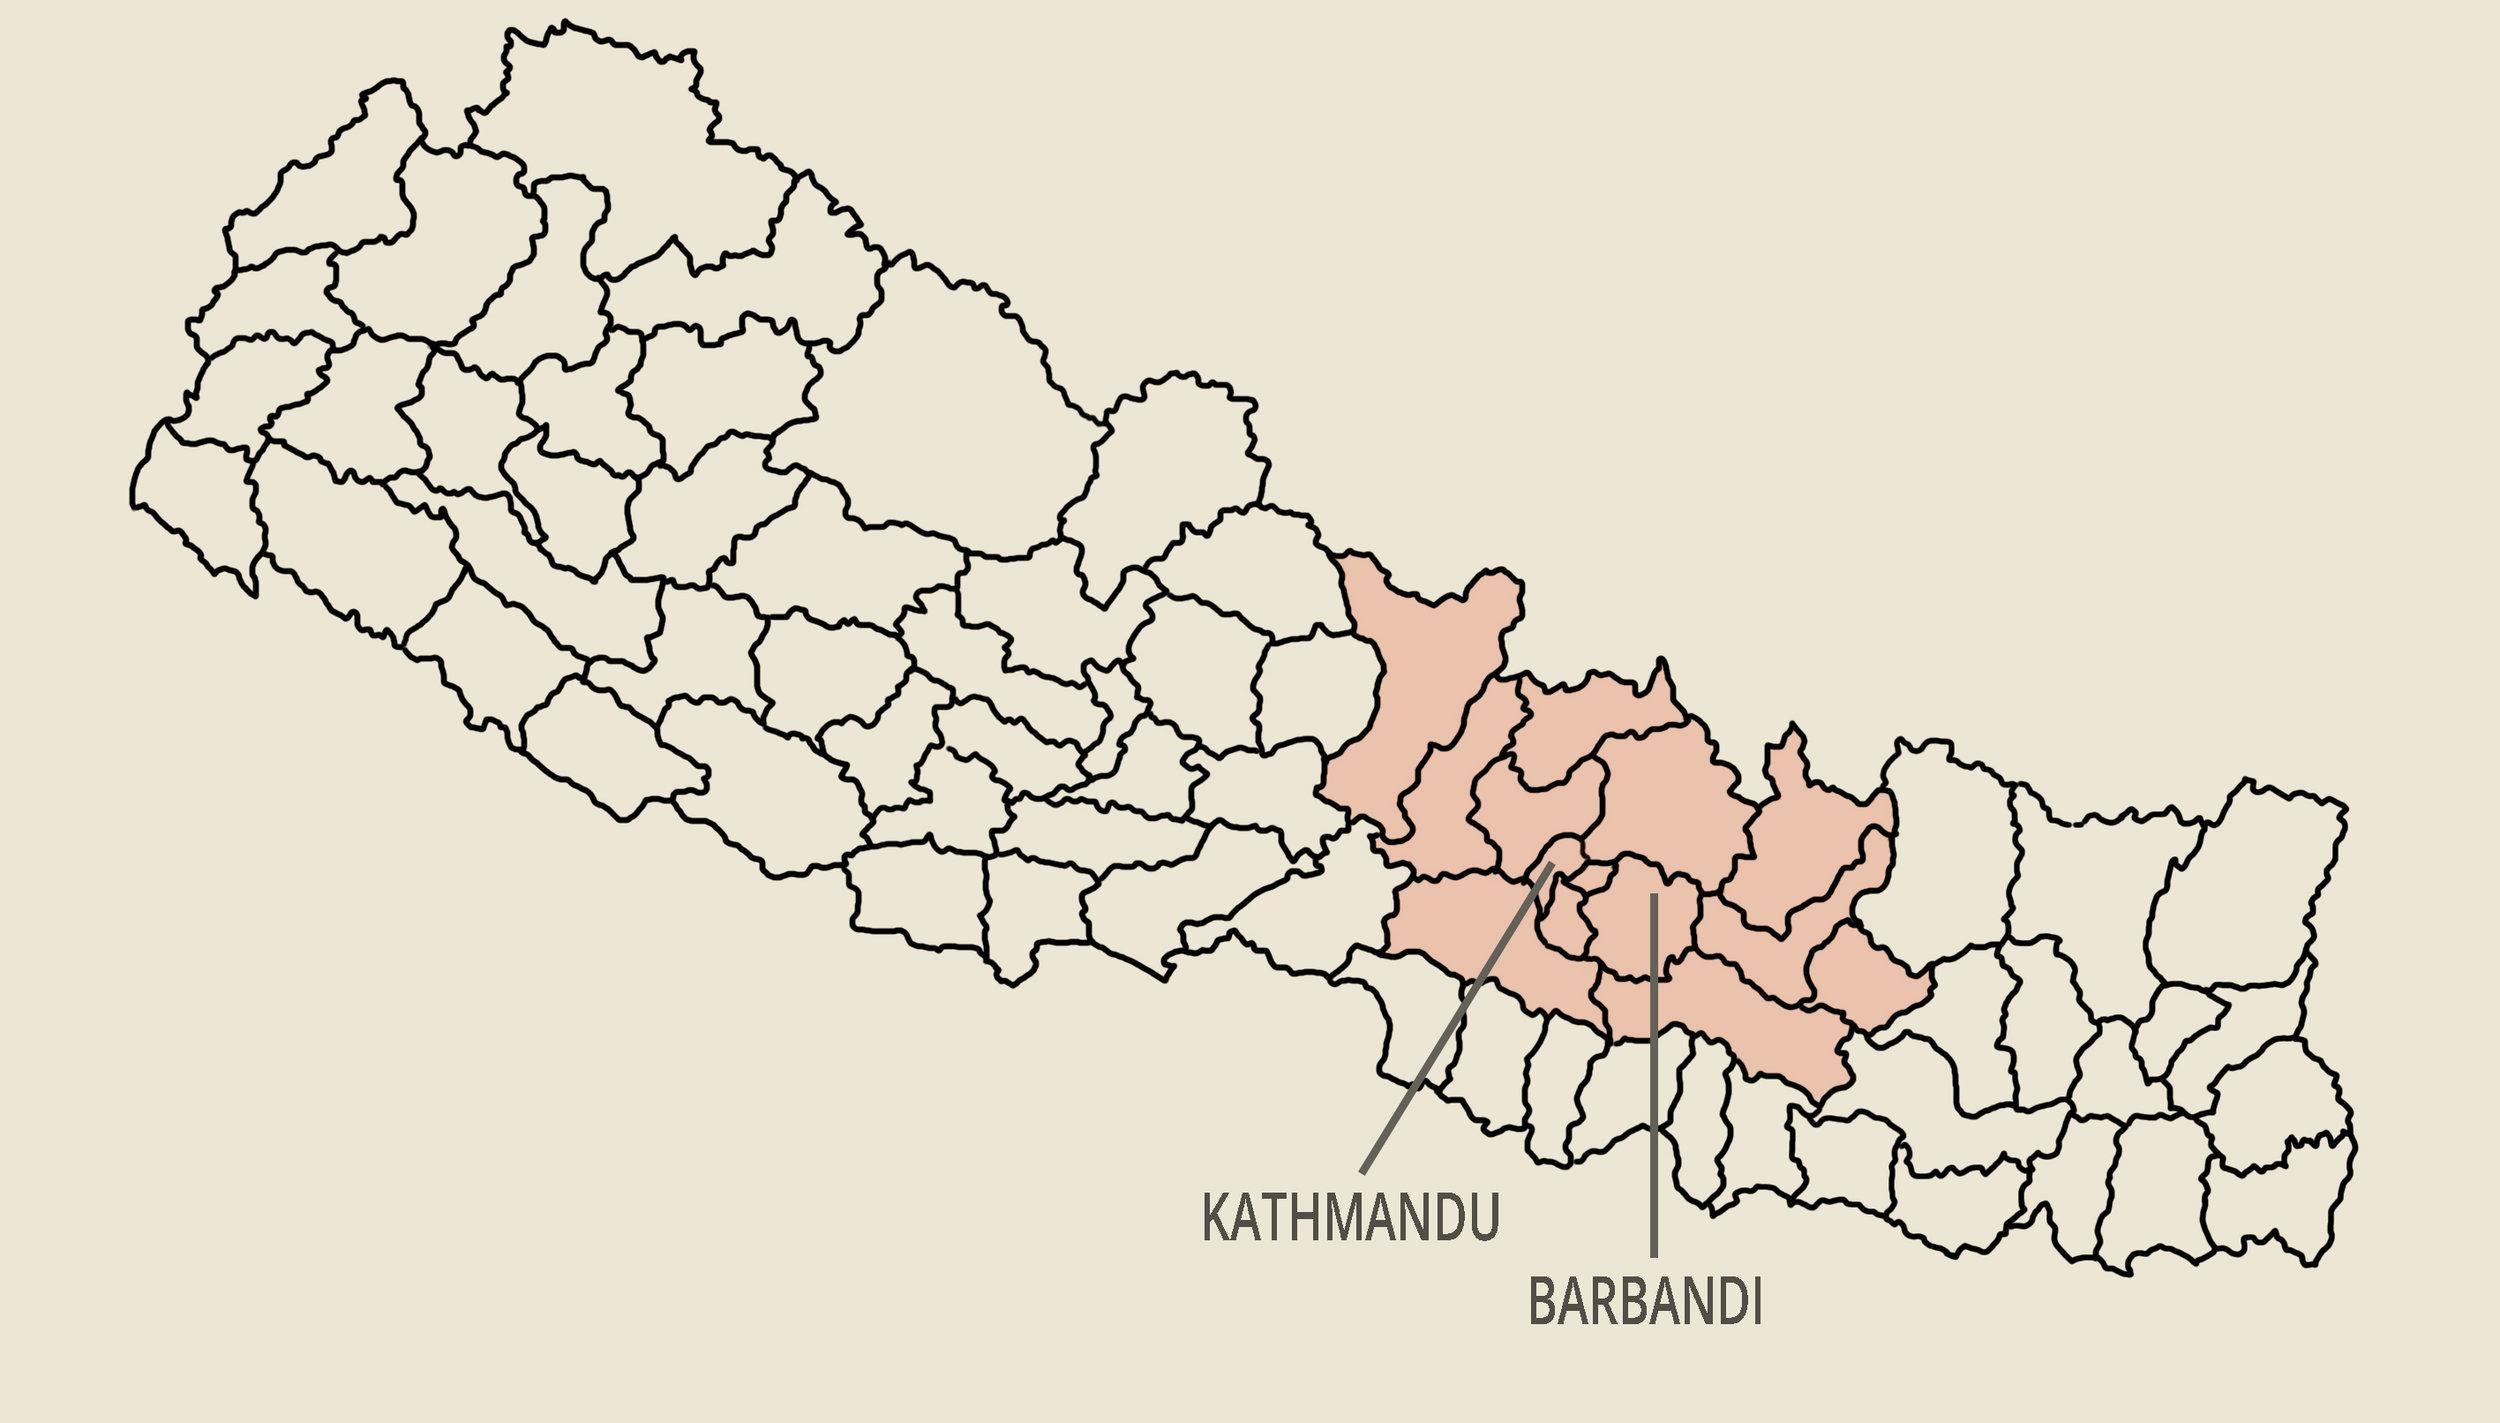 Barbandi map isolated.jpg